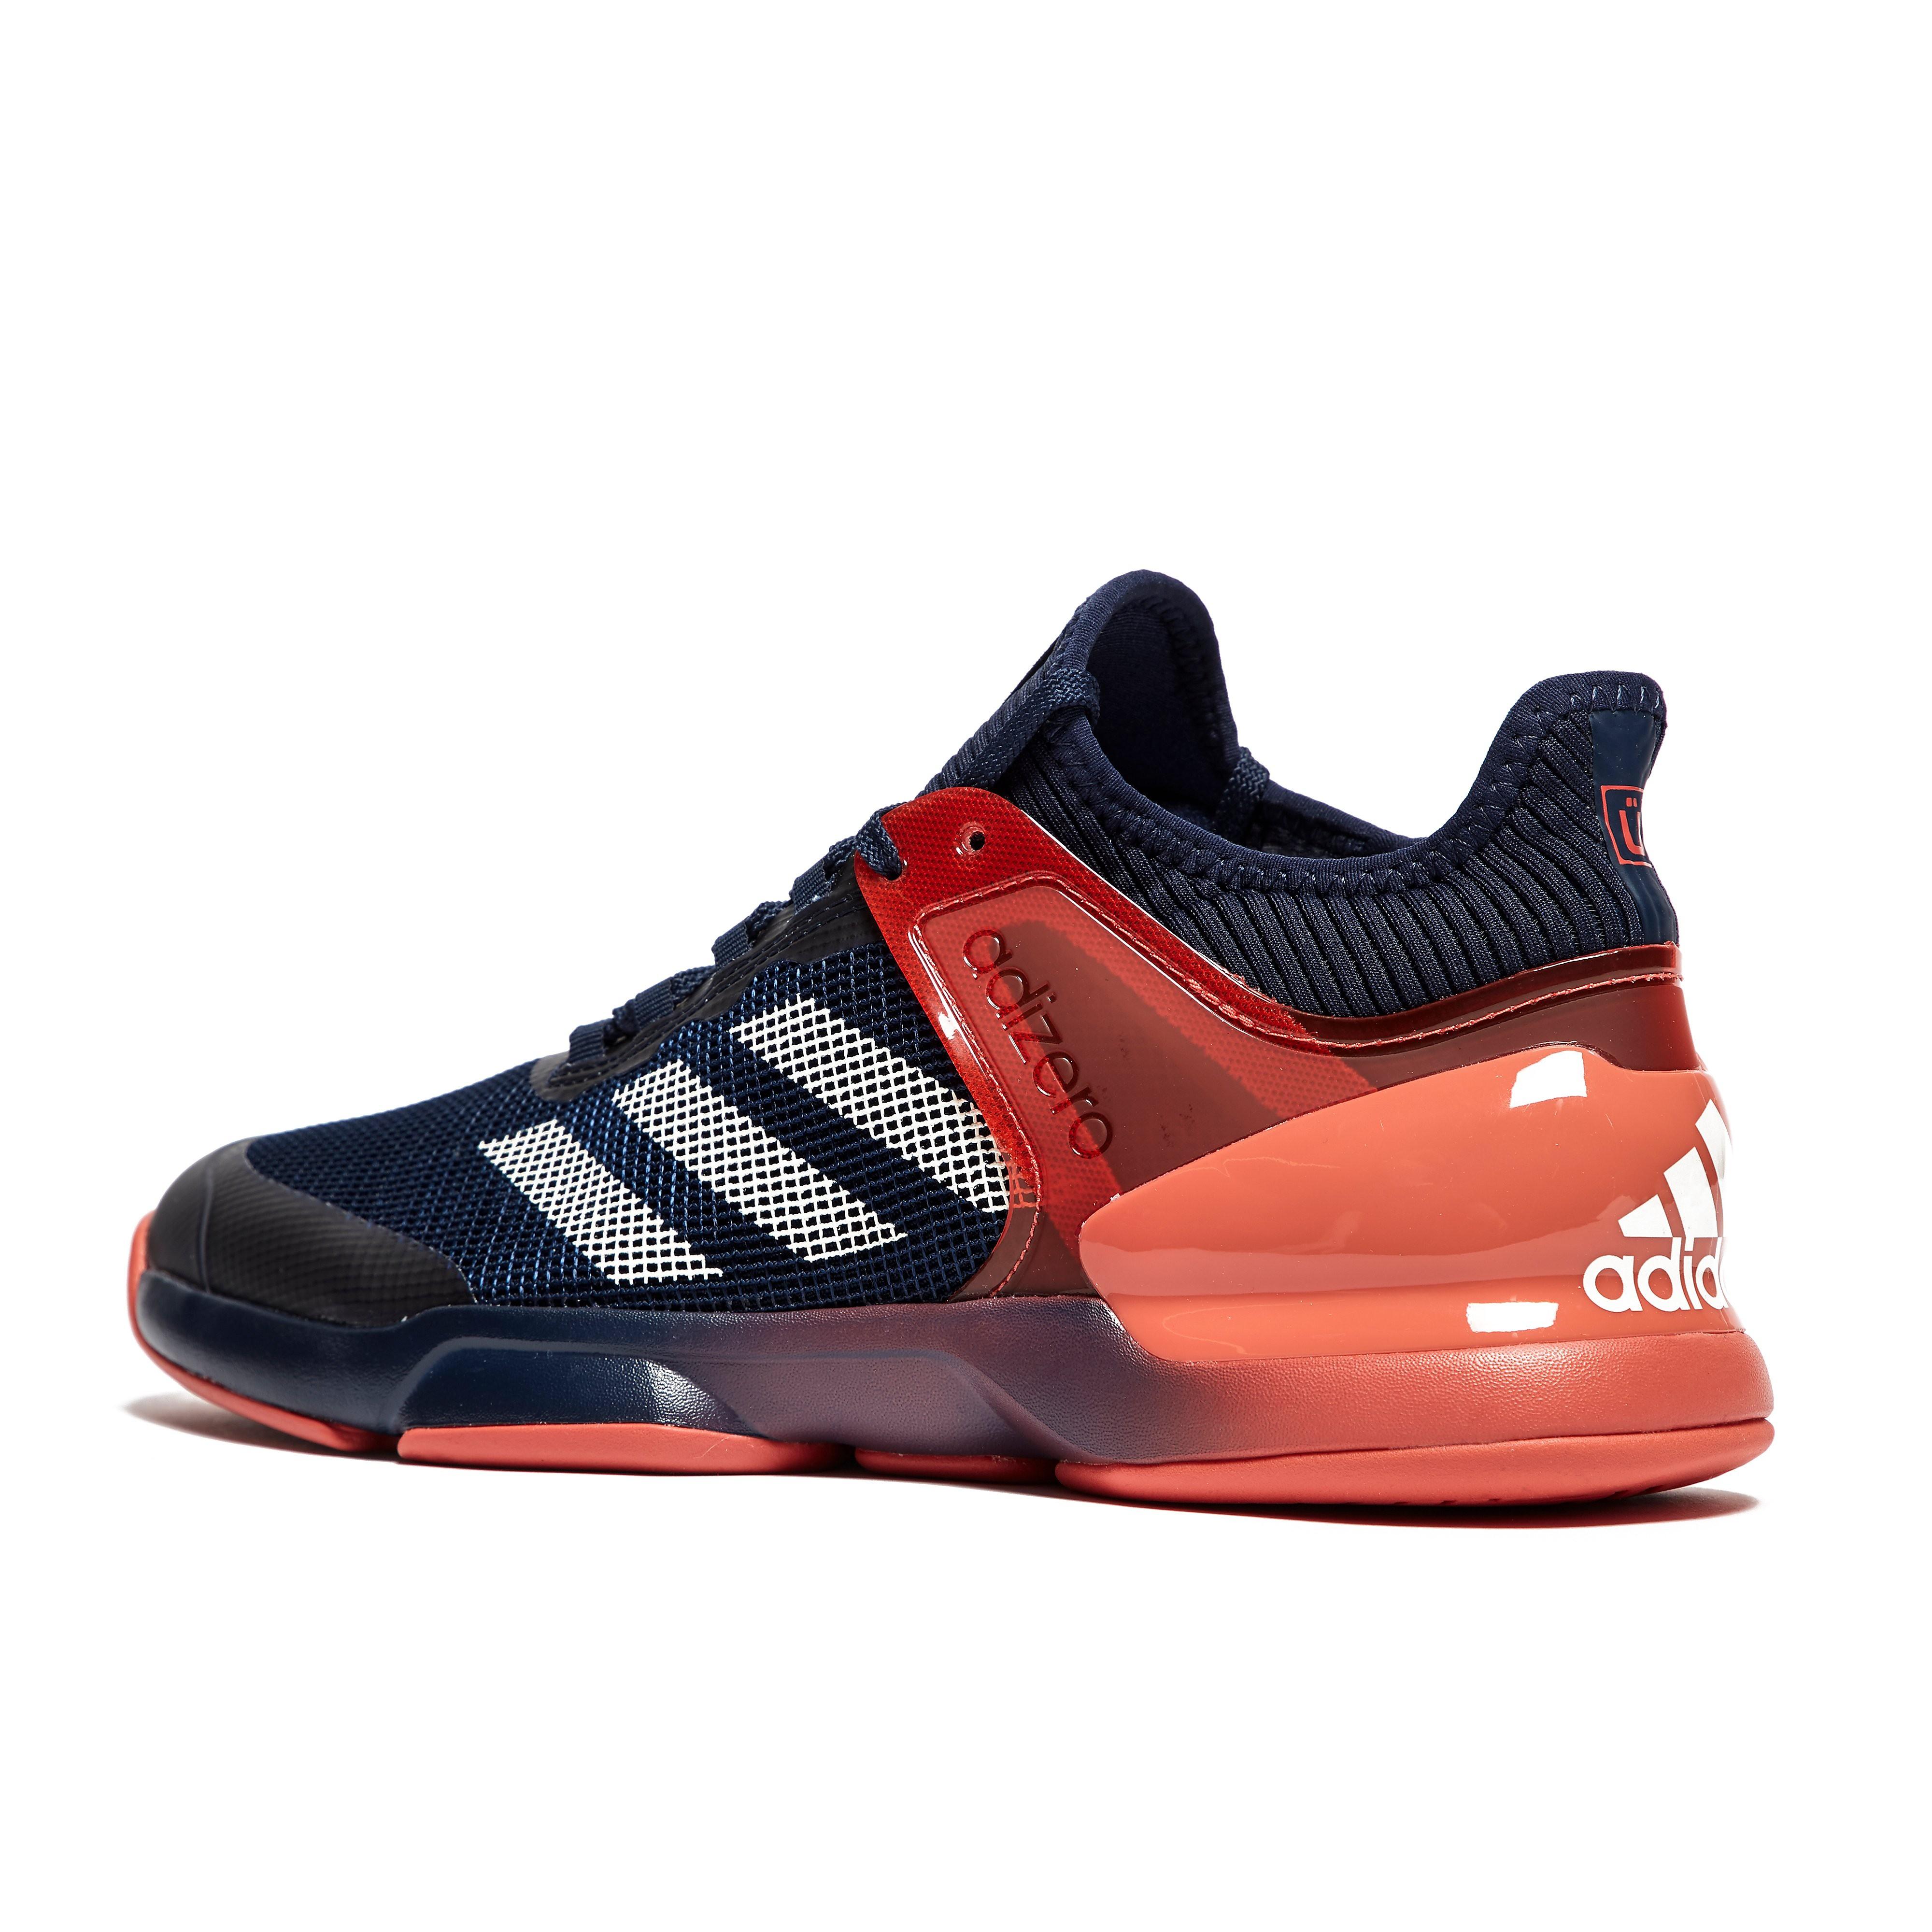 adidas Adizero Ubersonic 2.0 Men's Tennis Shoes